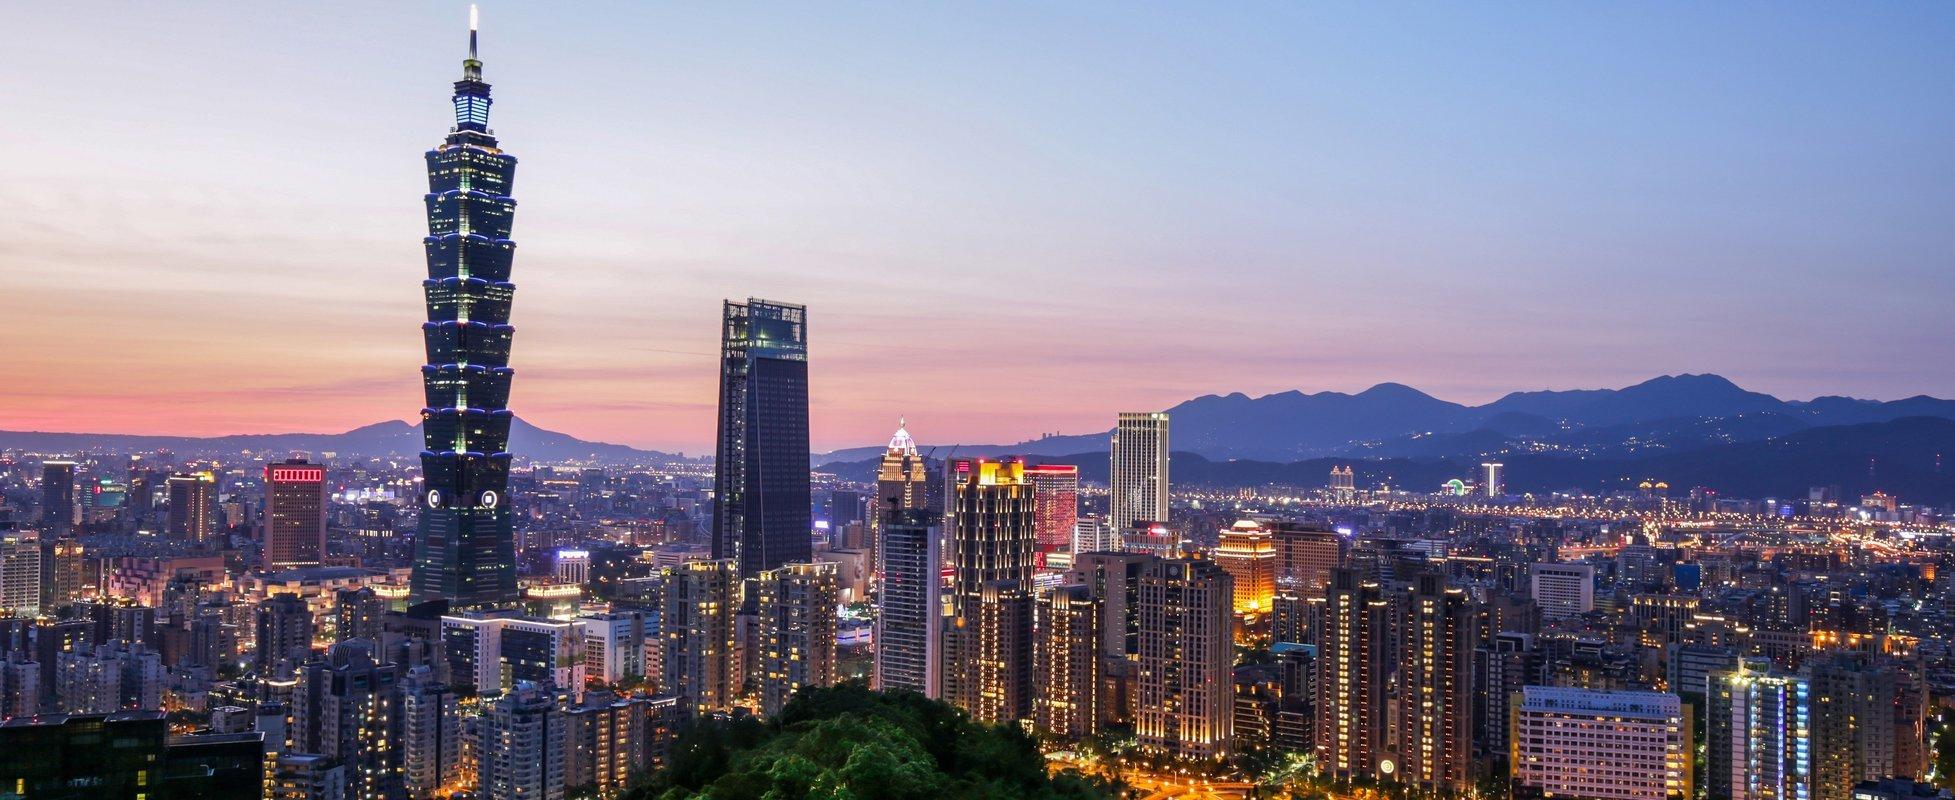 Taipei Sightseeings - Collection